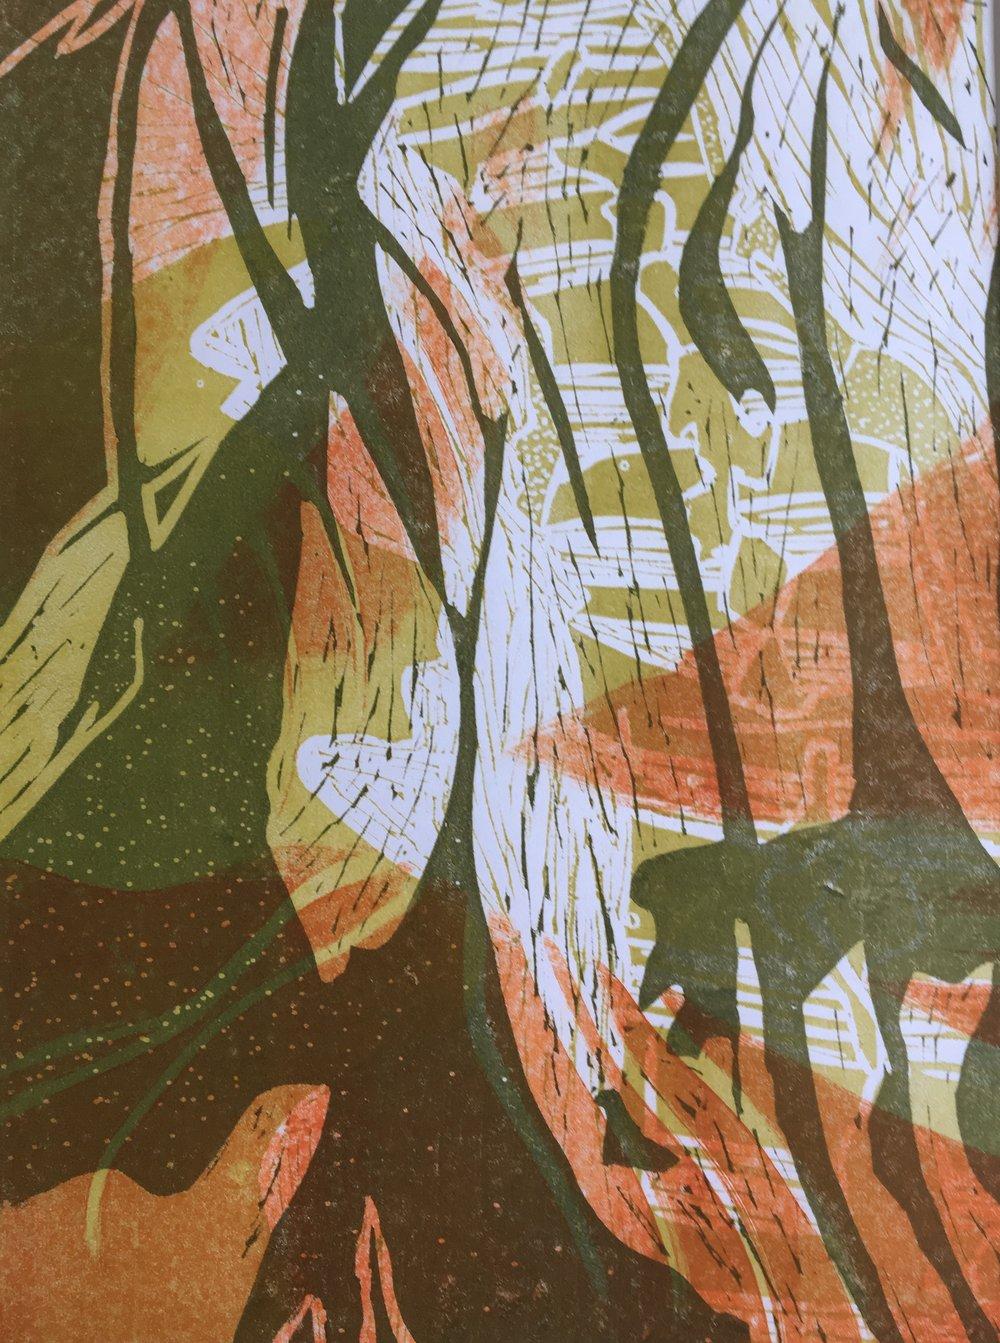 """Autumn Rain"", relief monoprint, 9"" x 12"", $55 (unframed)"